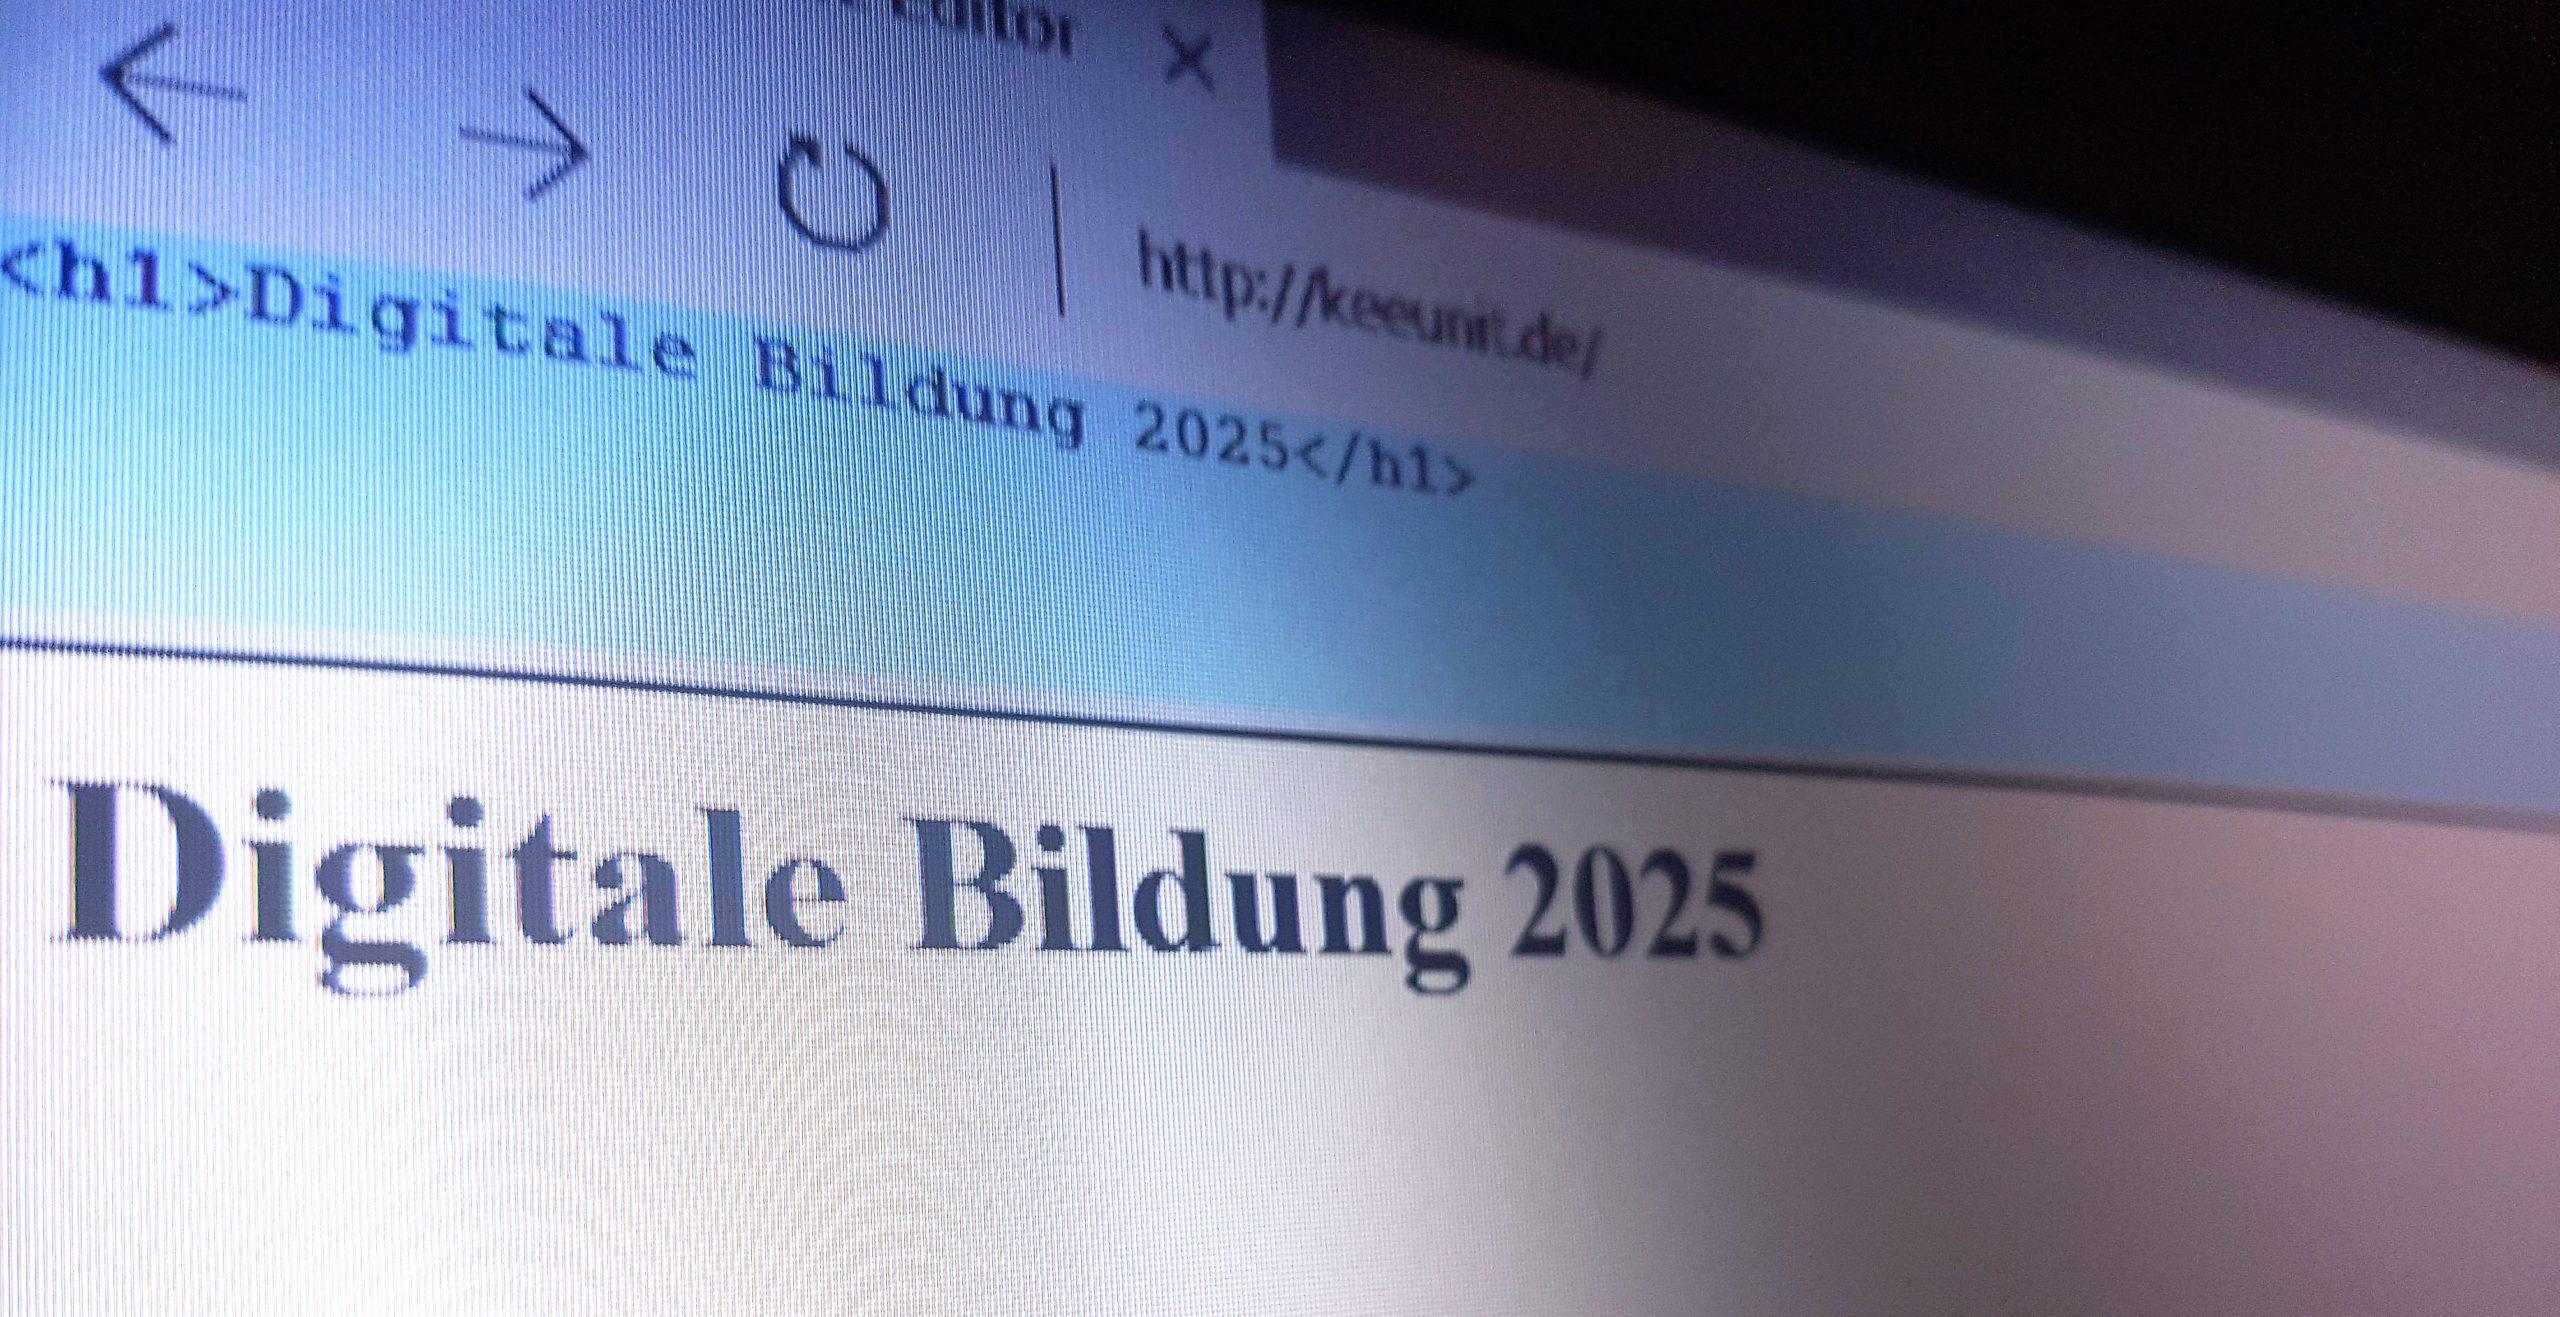 Digitale_Bildung_2025